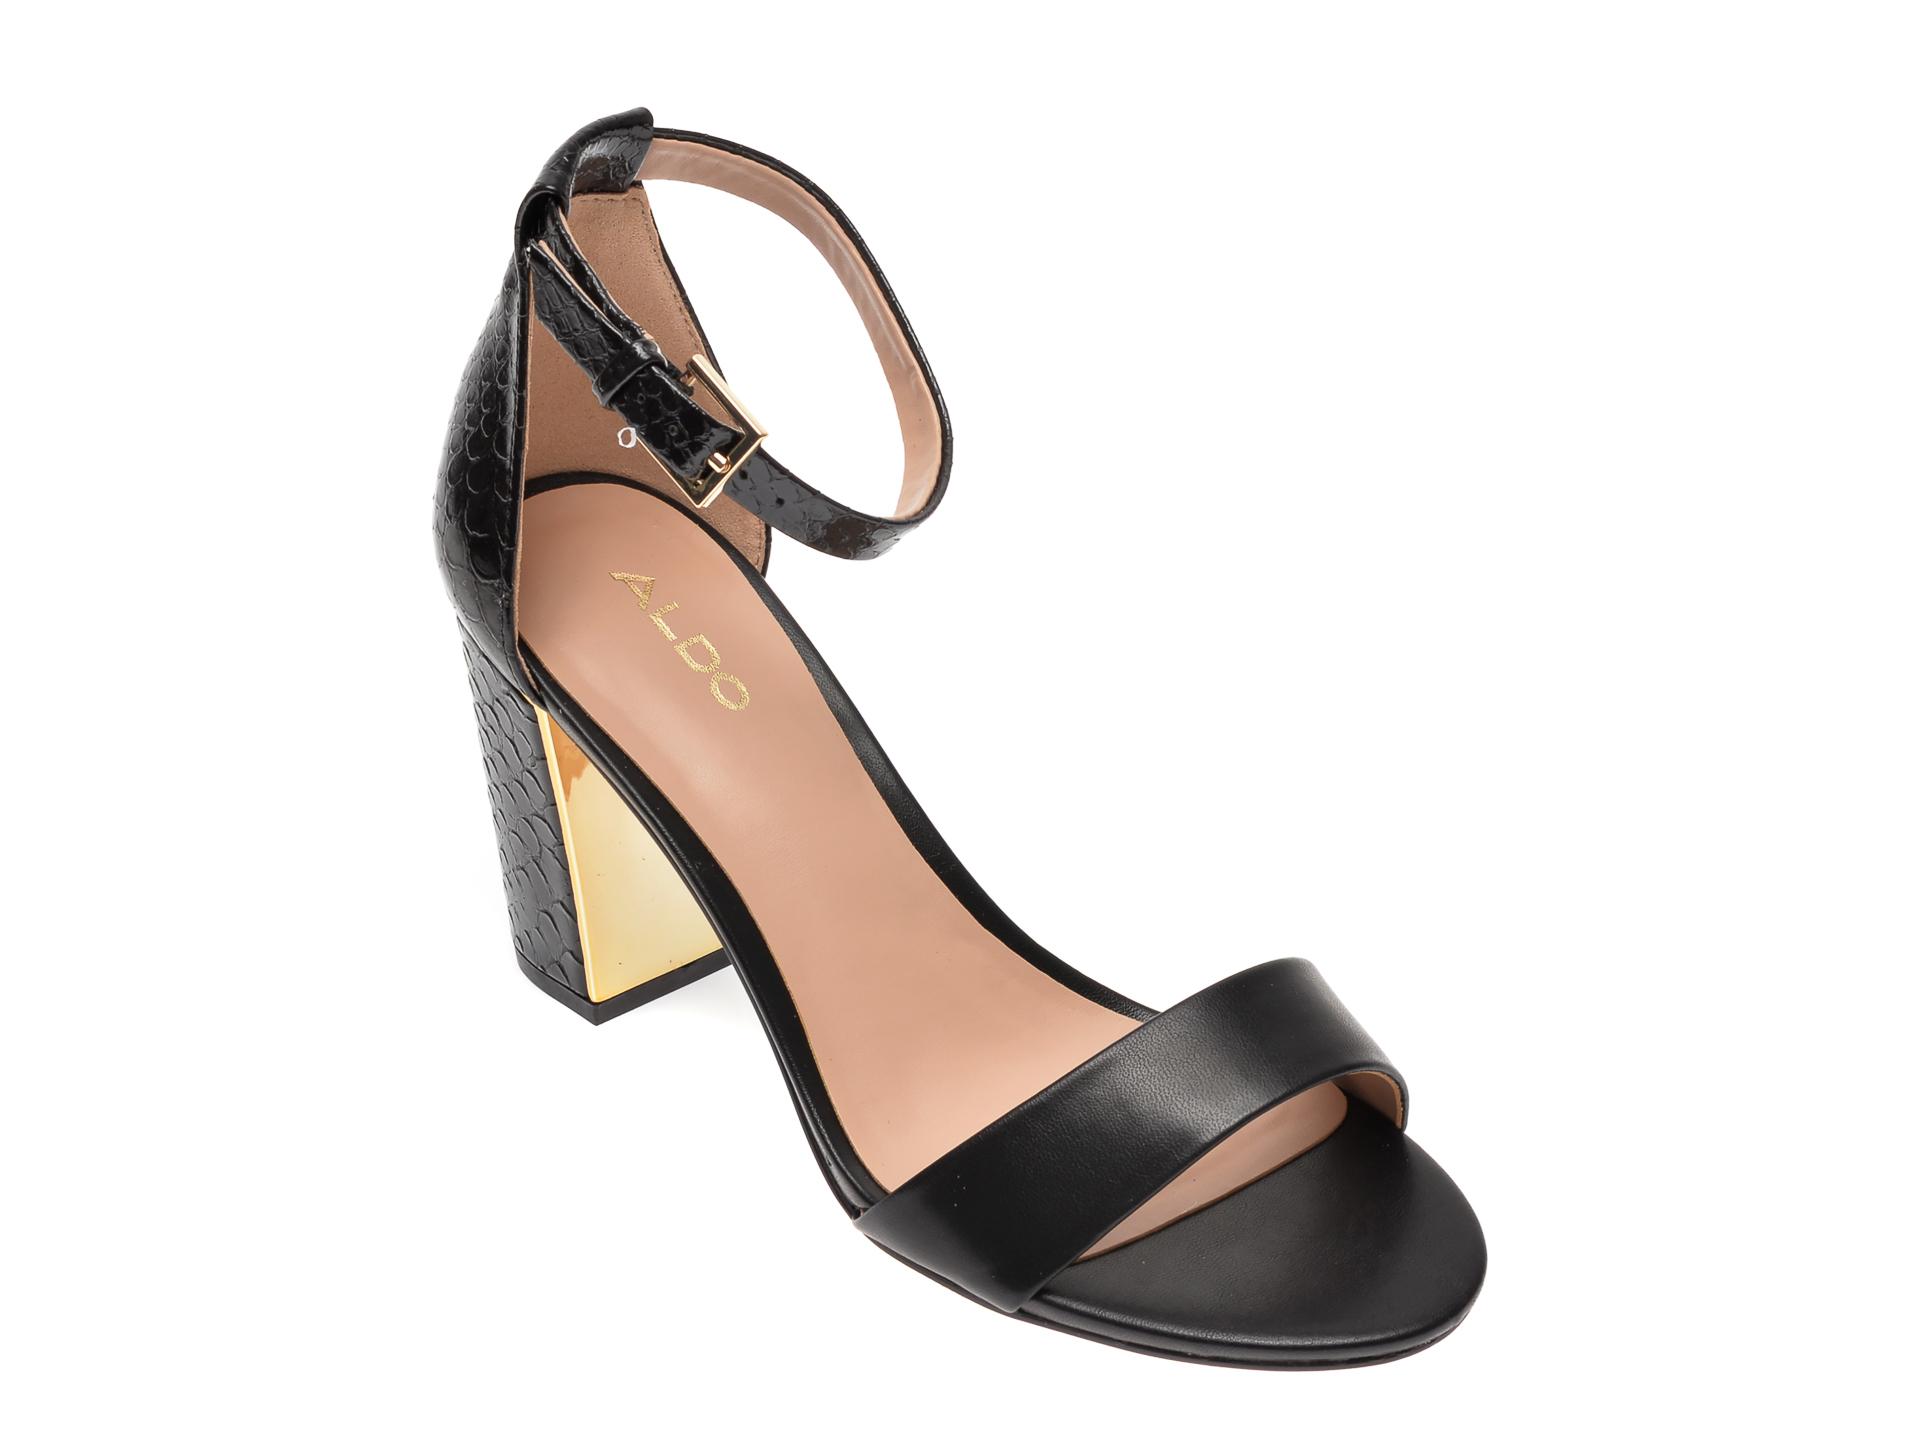 Sandale ALDO negre, Gradifolia001, din piele ecologica